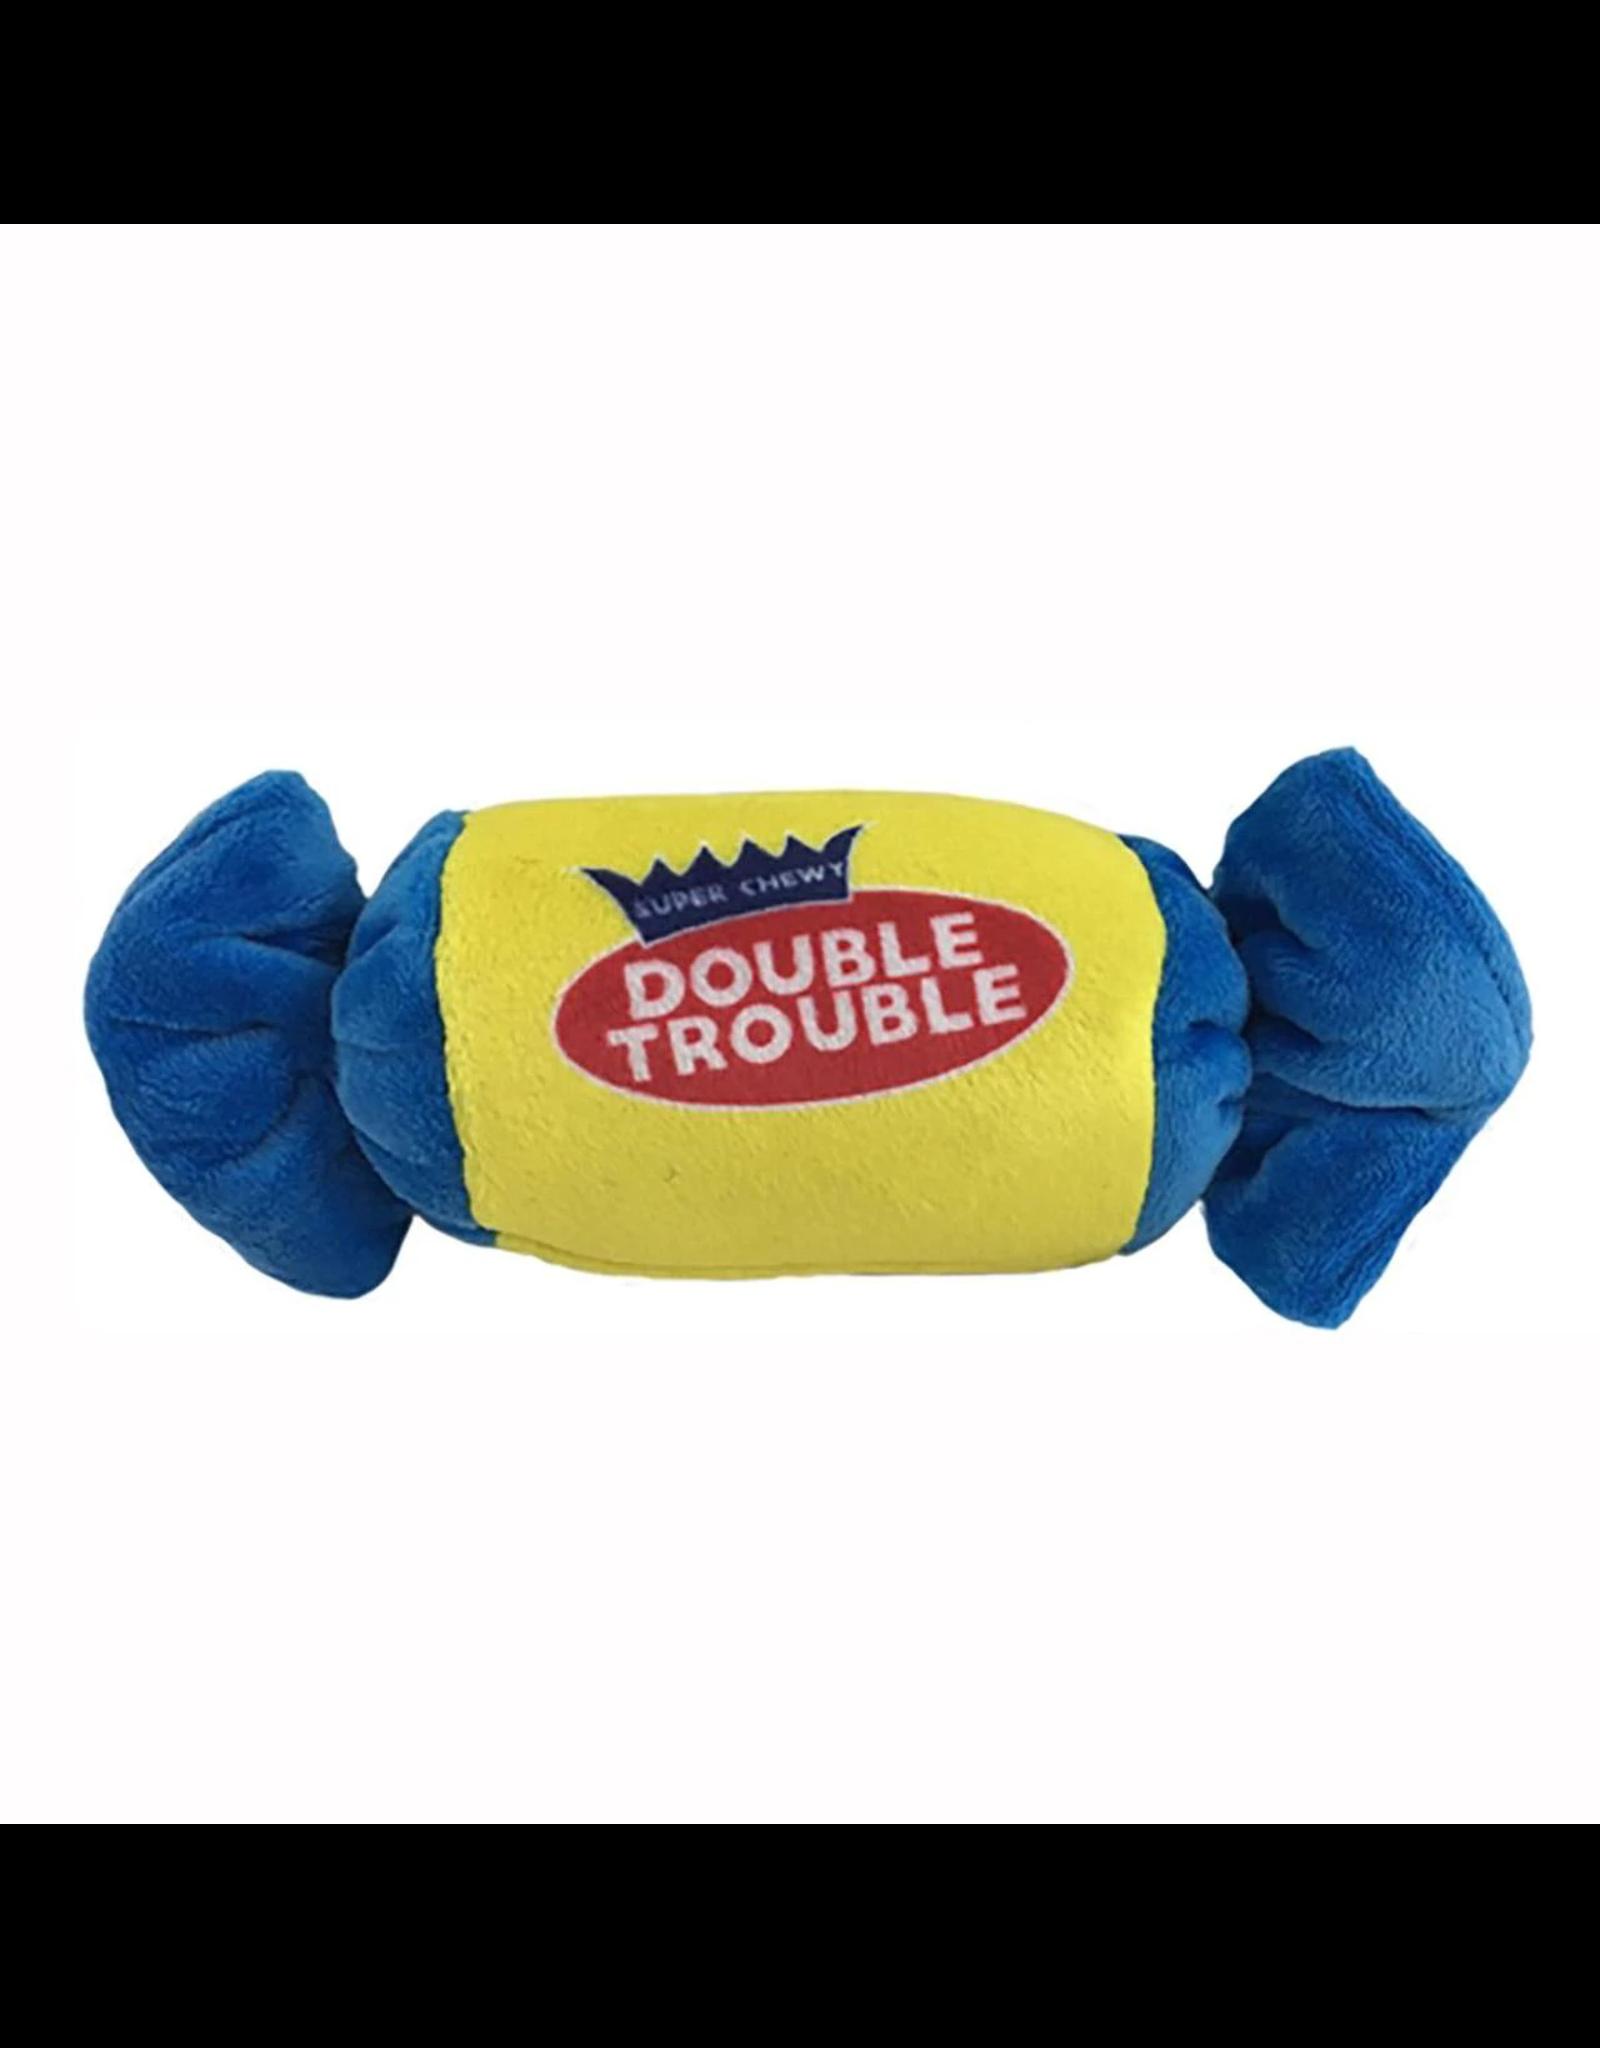 Lulubelles LULUBELLES POWER PLUSH DOUBLE TROUBLE TOY